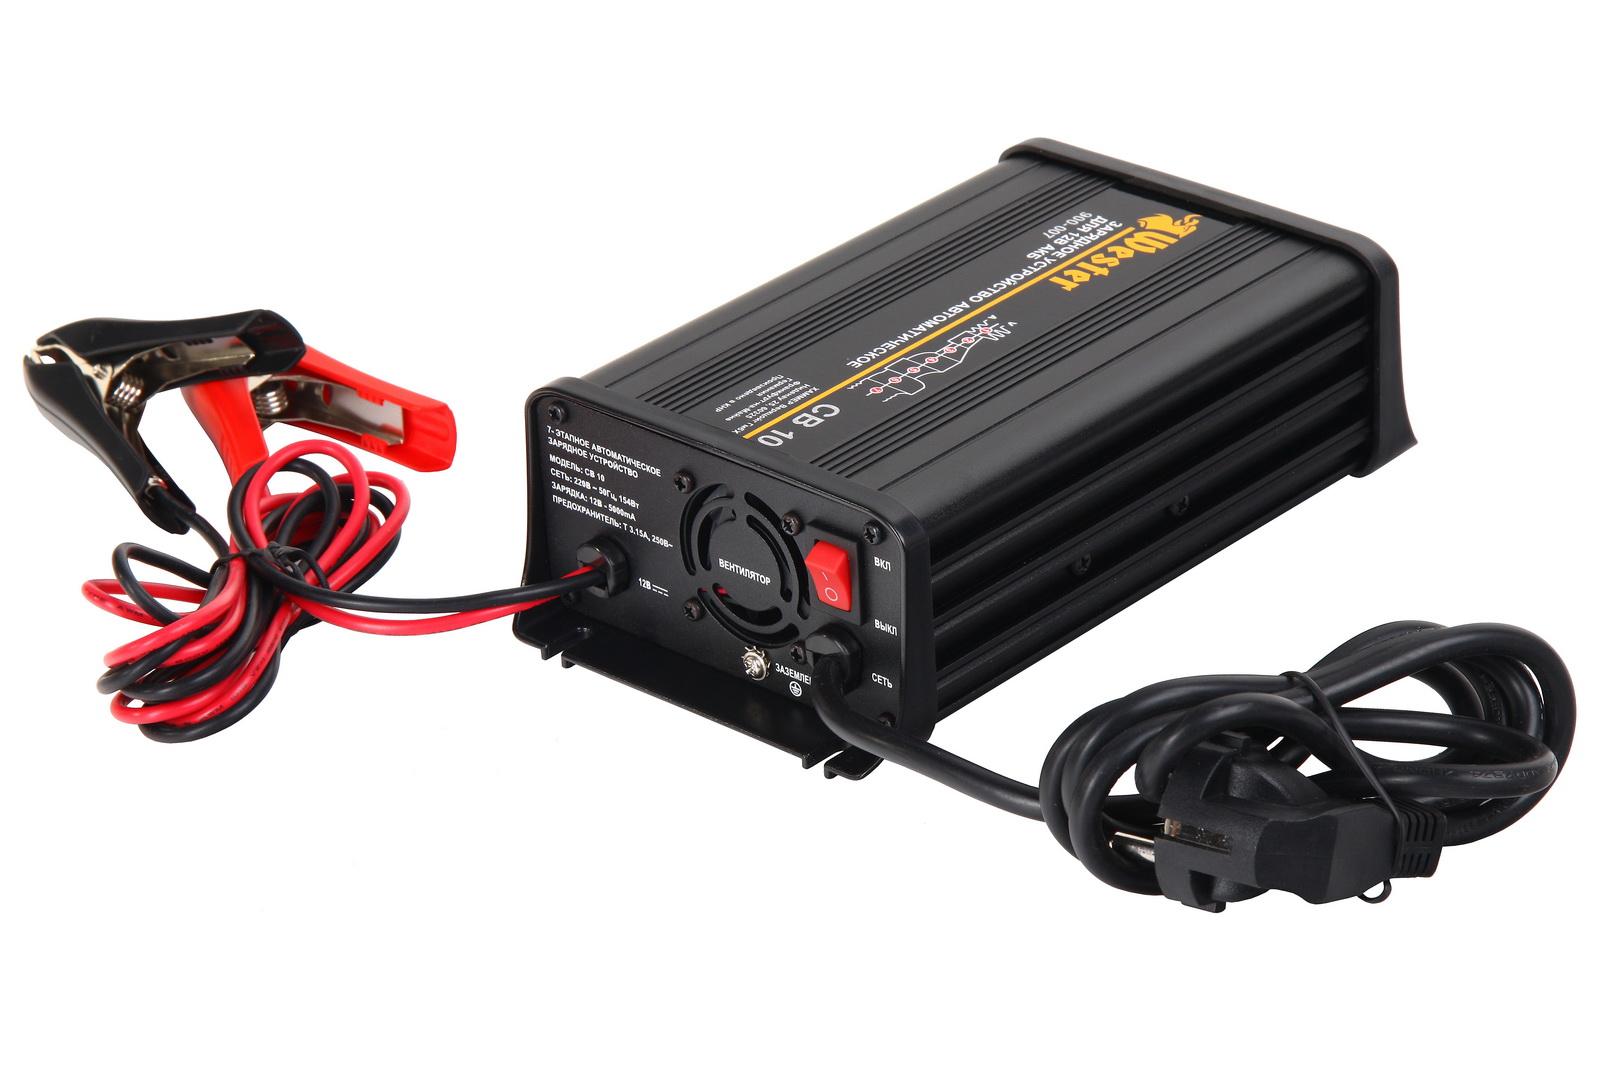 Устройство зарядное Wester СВ10 устройство зарядное wester ch20